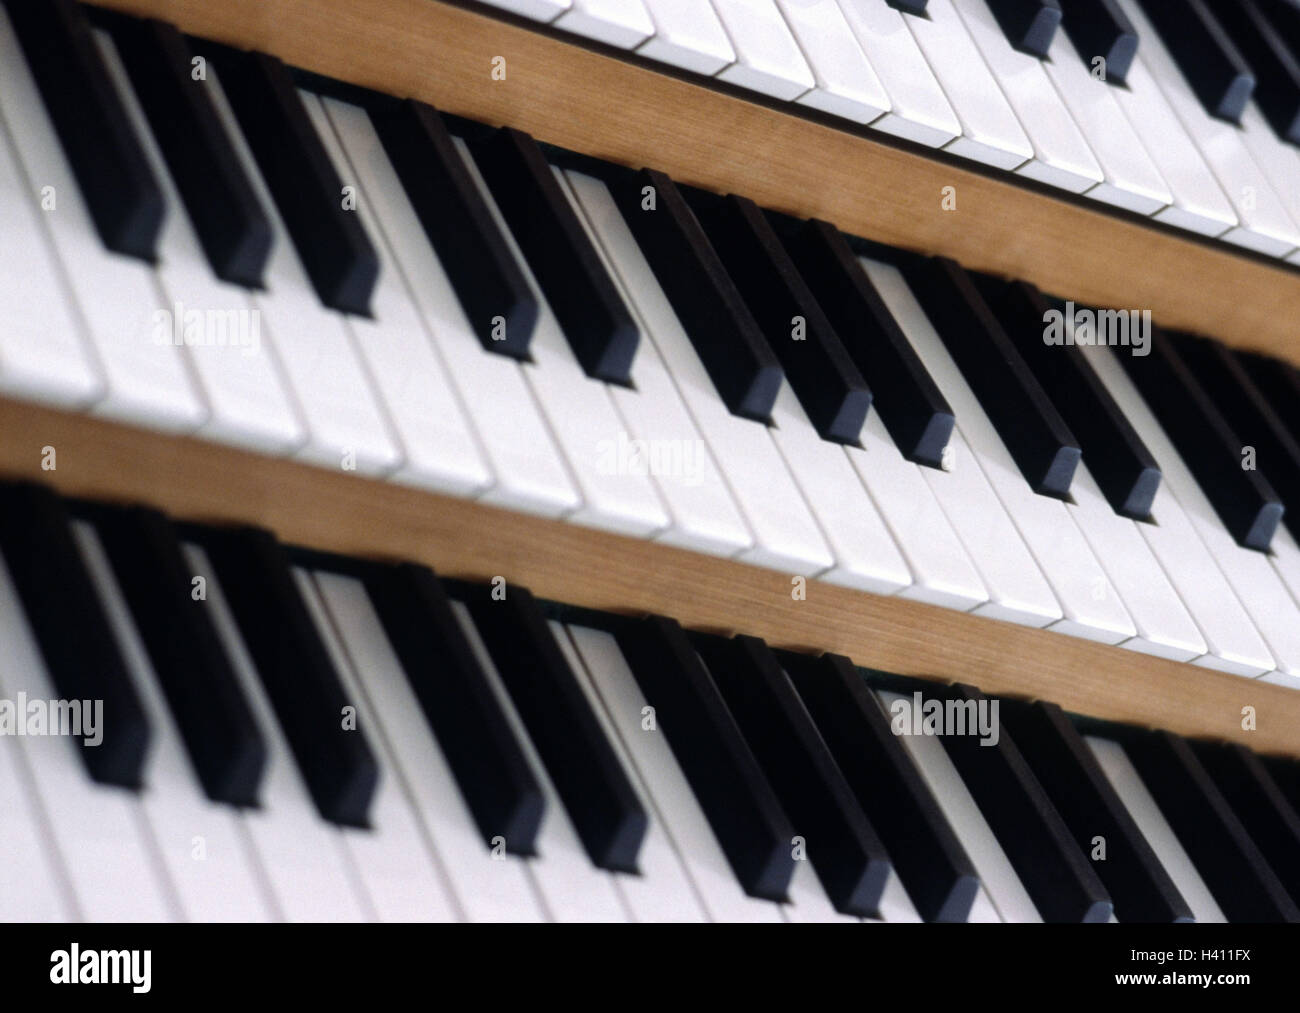 Organ, buttons, detail, organ keyboard, digits, keyboard, keyboard, organ buttons, music, musical instrument, instrument, - Stock Image